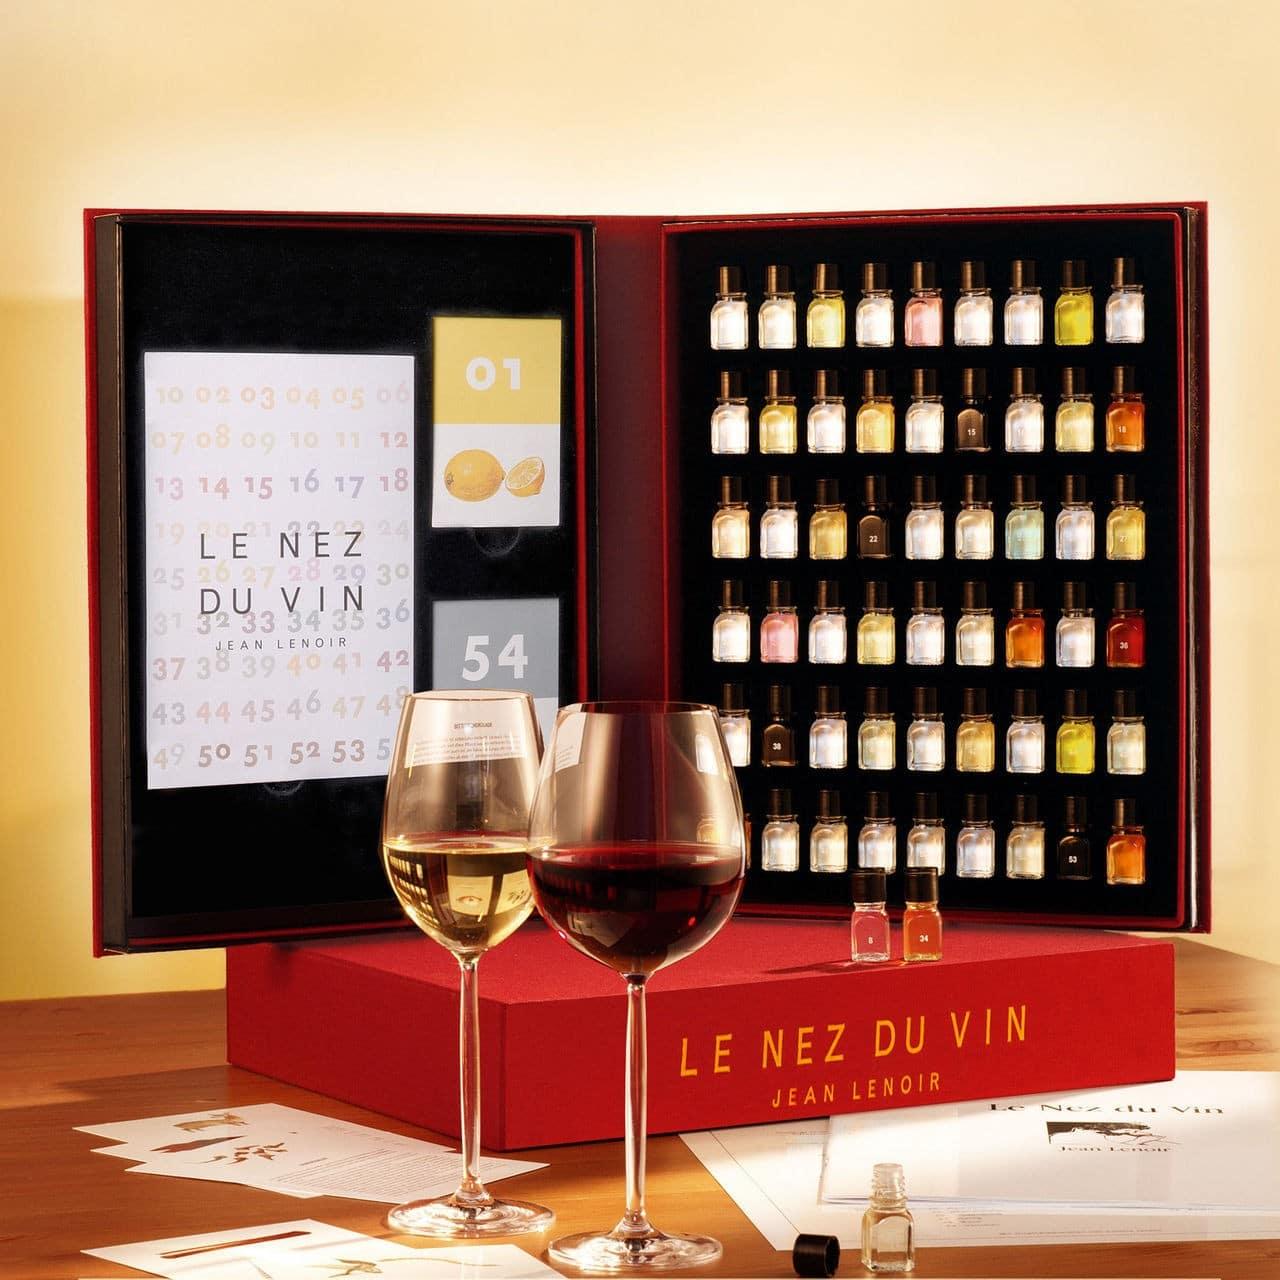 Vin en ligne : acheter du vin sur internet sans se tromper